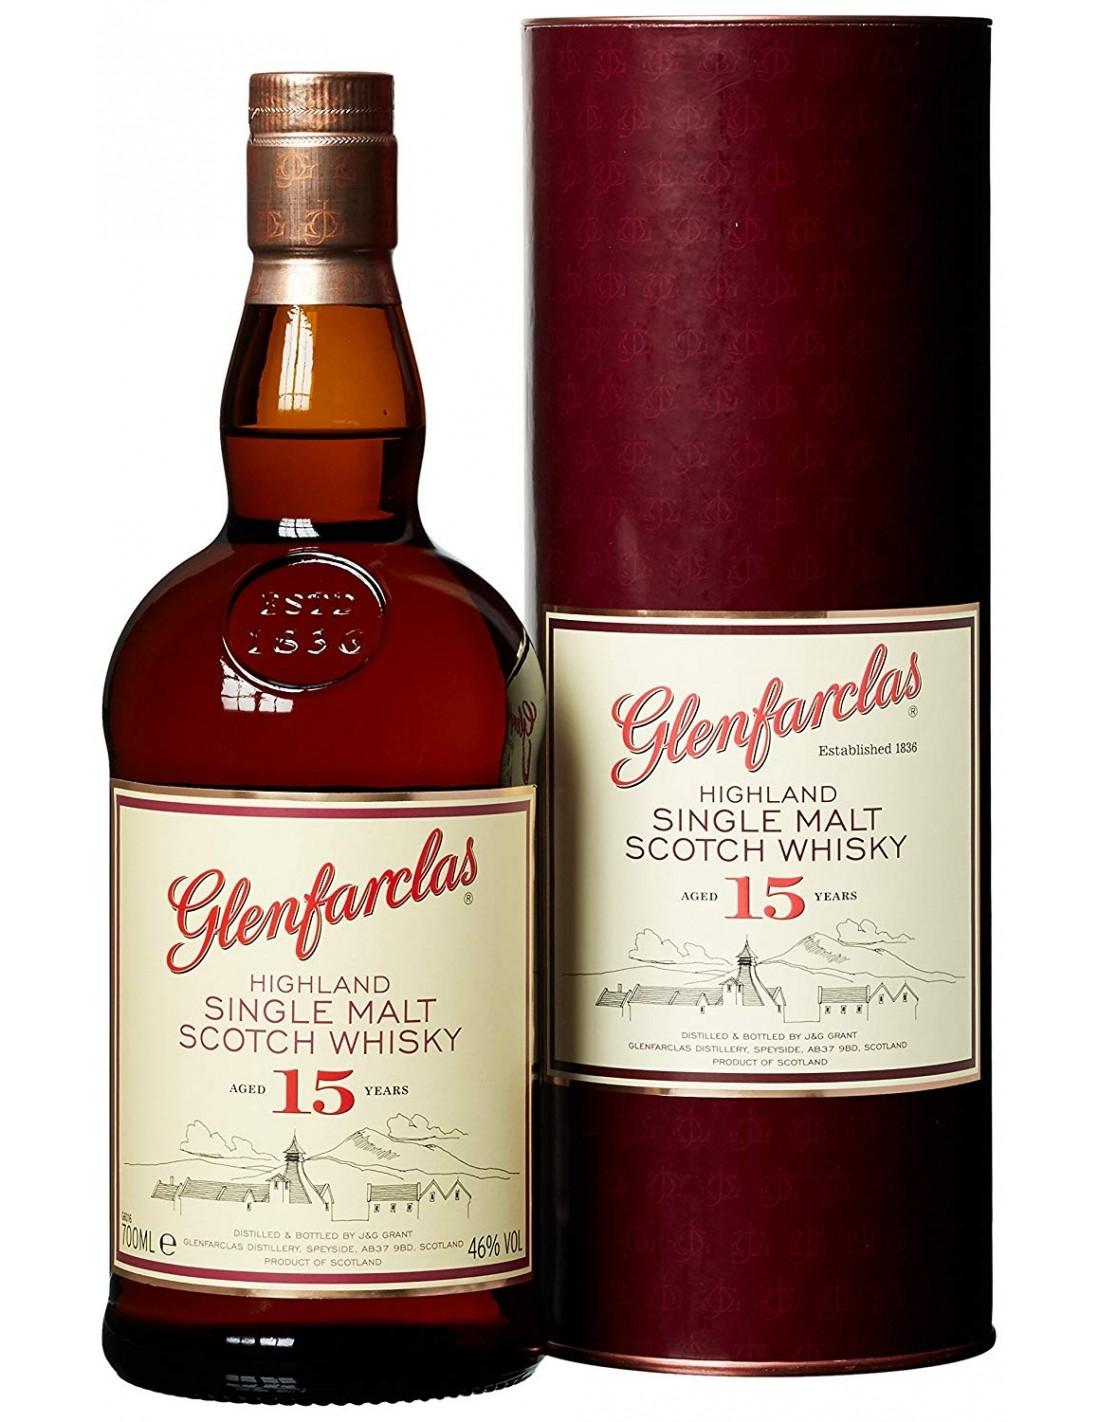 Whisky Glenfarclas, 15 ani, 46% alc., 0.7L, Scotia